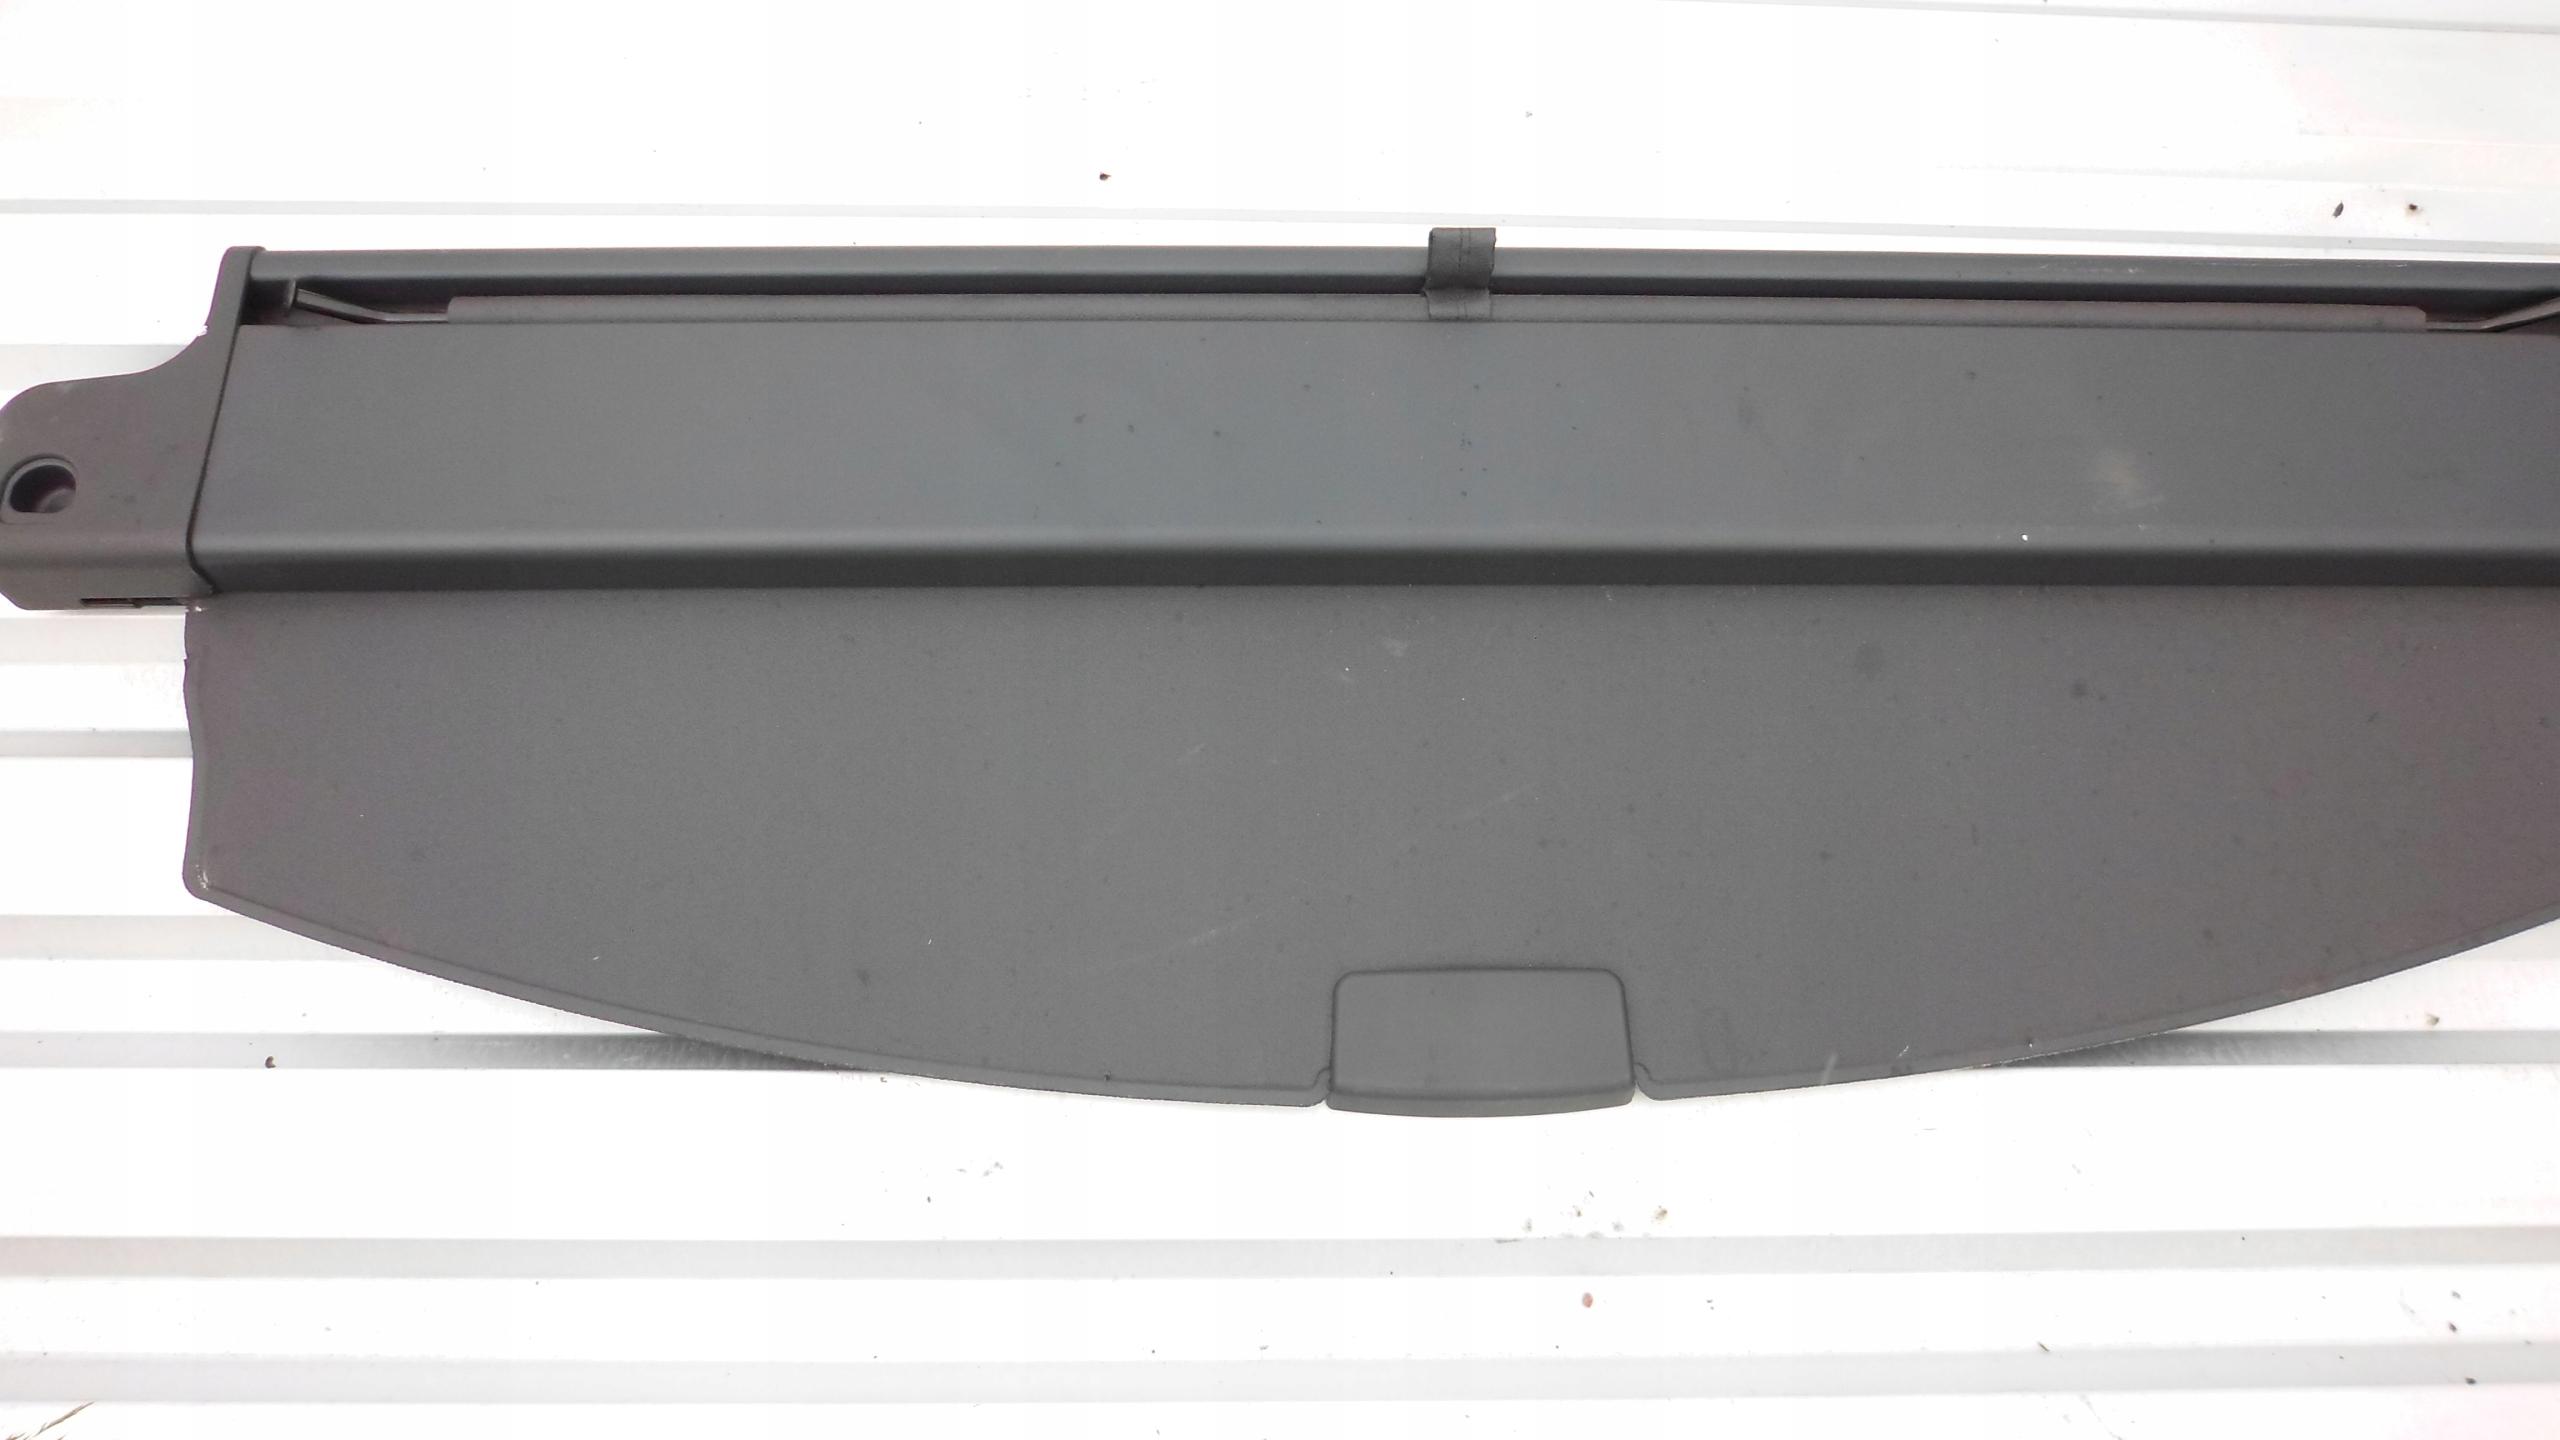 Inne rodzaje TOYOTA AVENSIS T25 03-06 KOMBI ROLETA BAGAŻNIKA - 7456456919 XS61